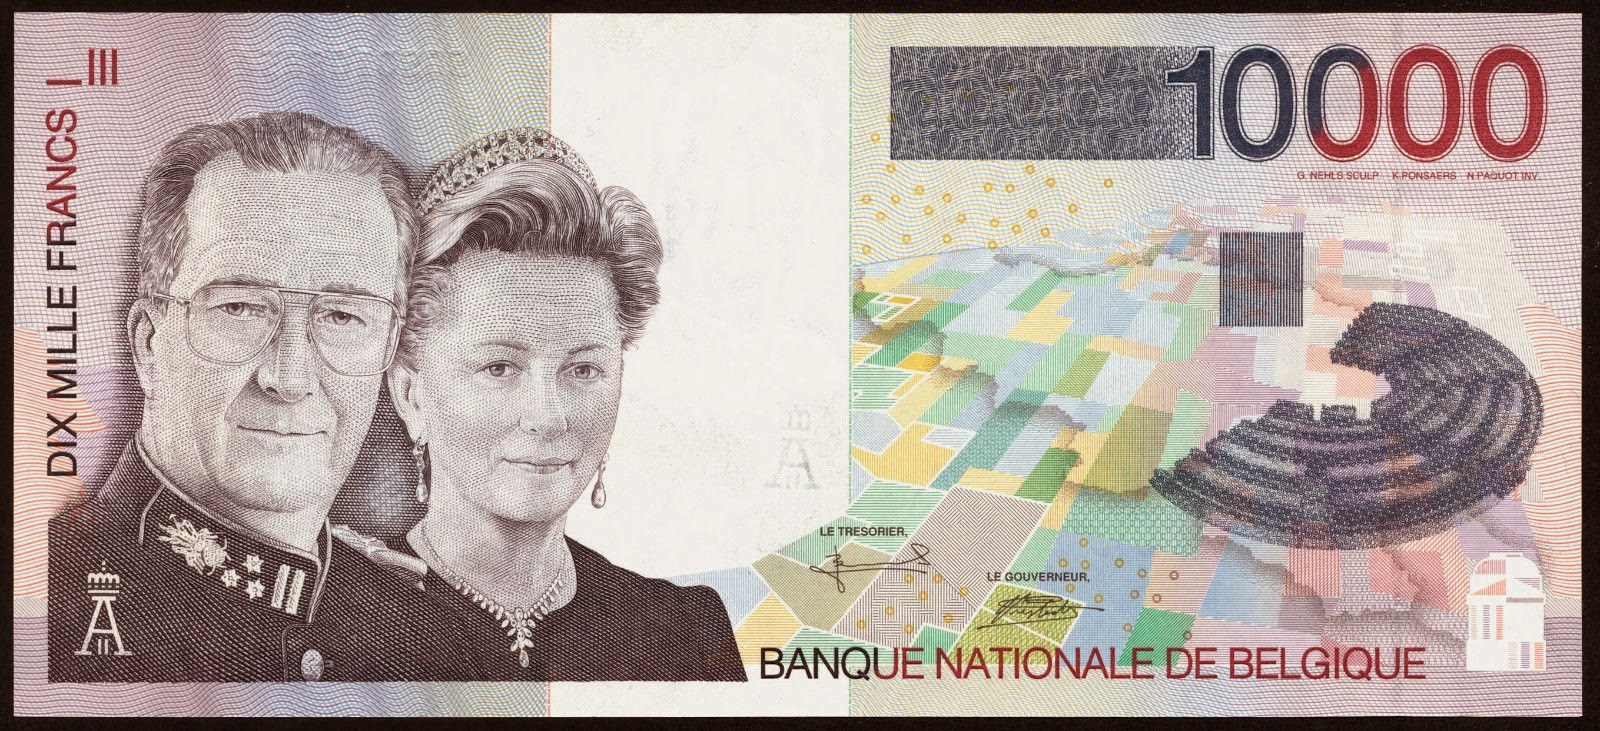 Belgium Banknotes 10000 Belgian Francs banknote 1997 King Albert II and Queen Paola